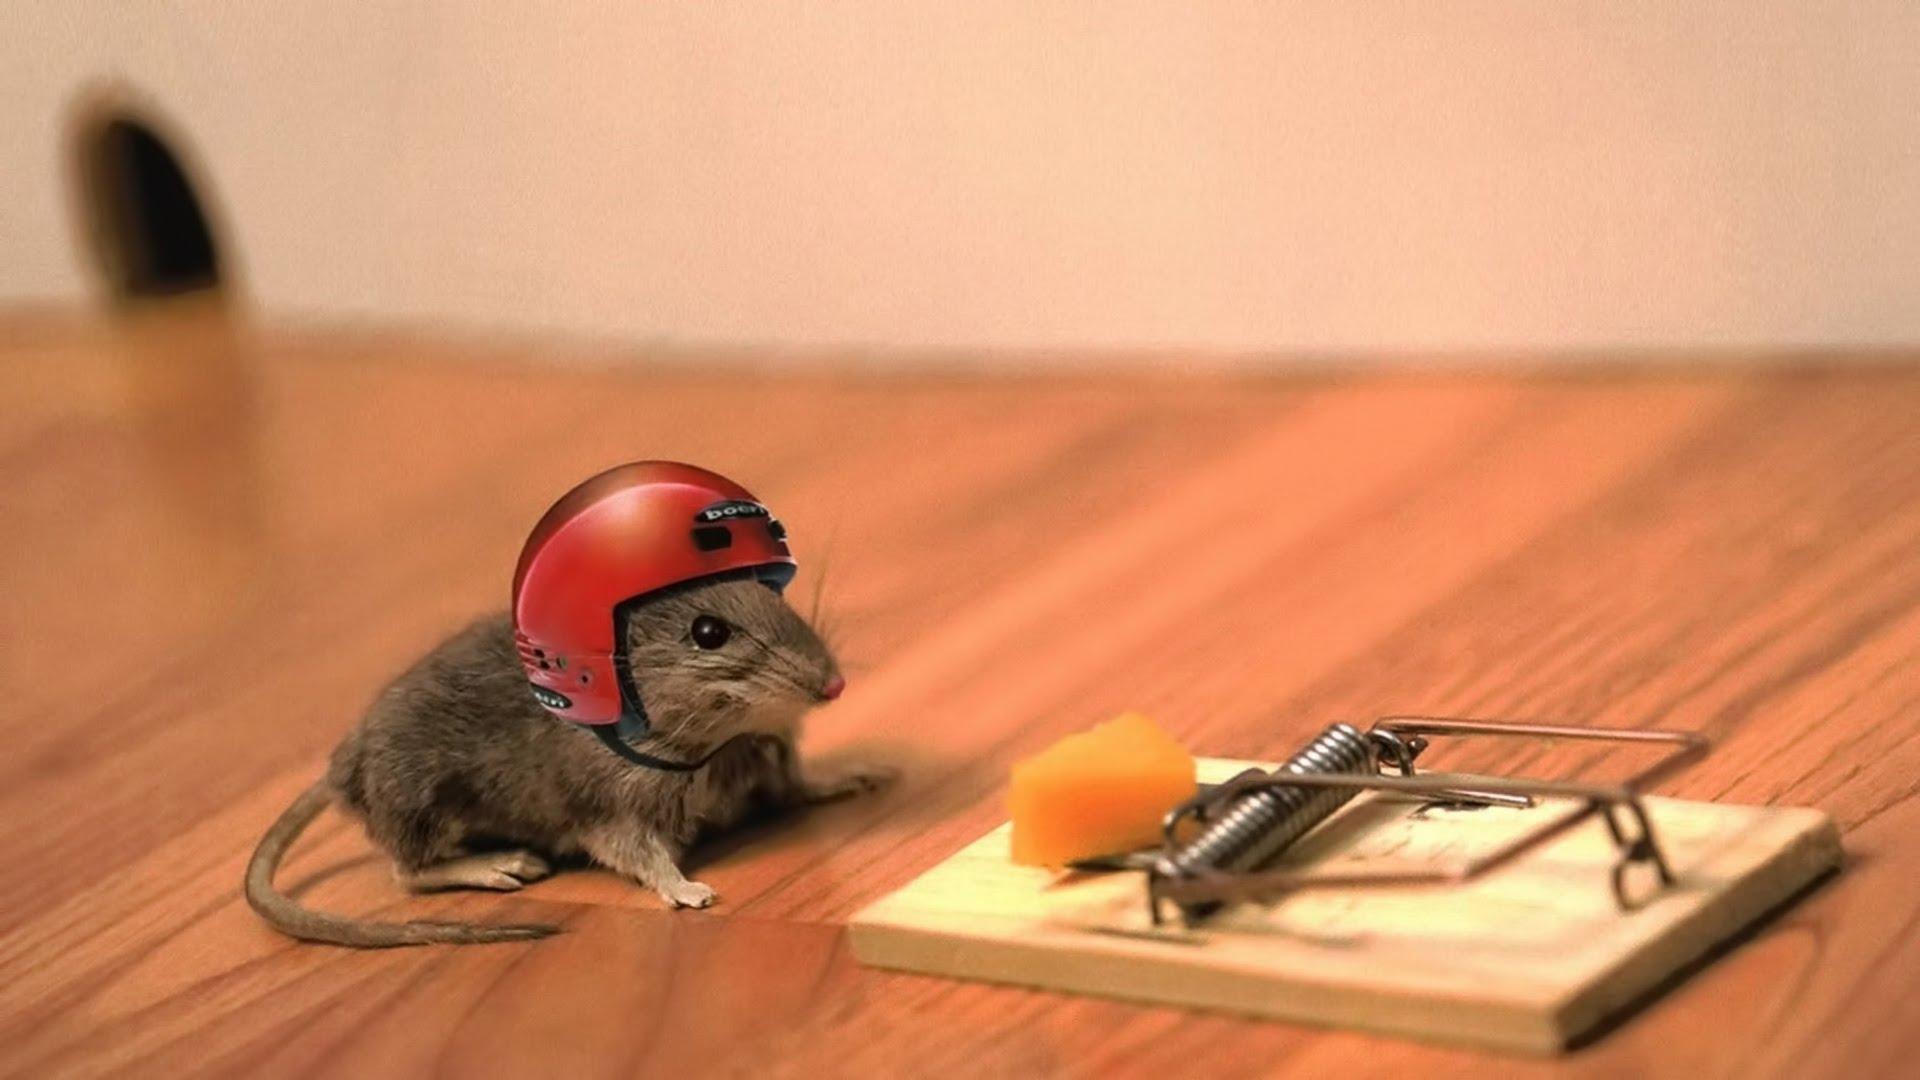 Cuma Dengan Nangkep Tikus Kamu Bisa Dapet Duit